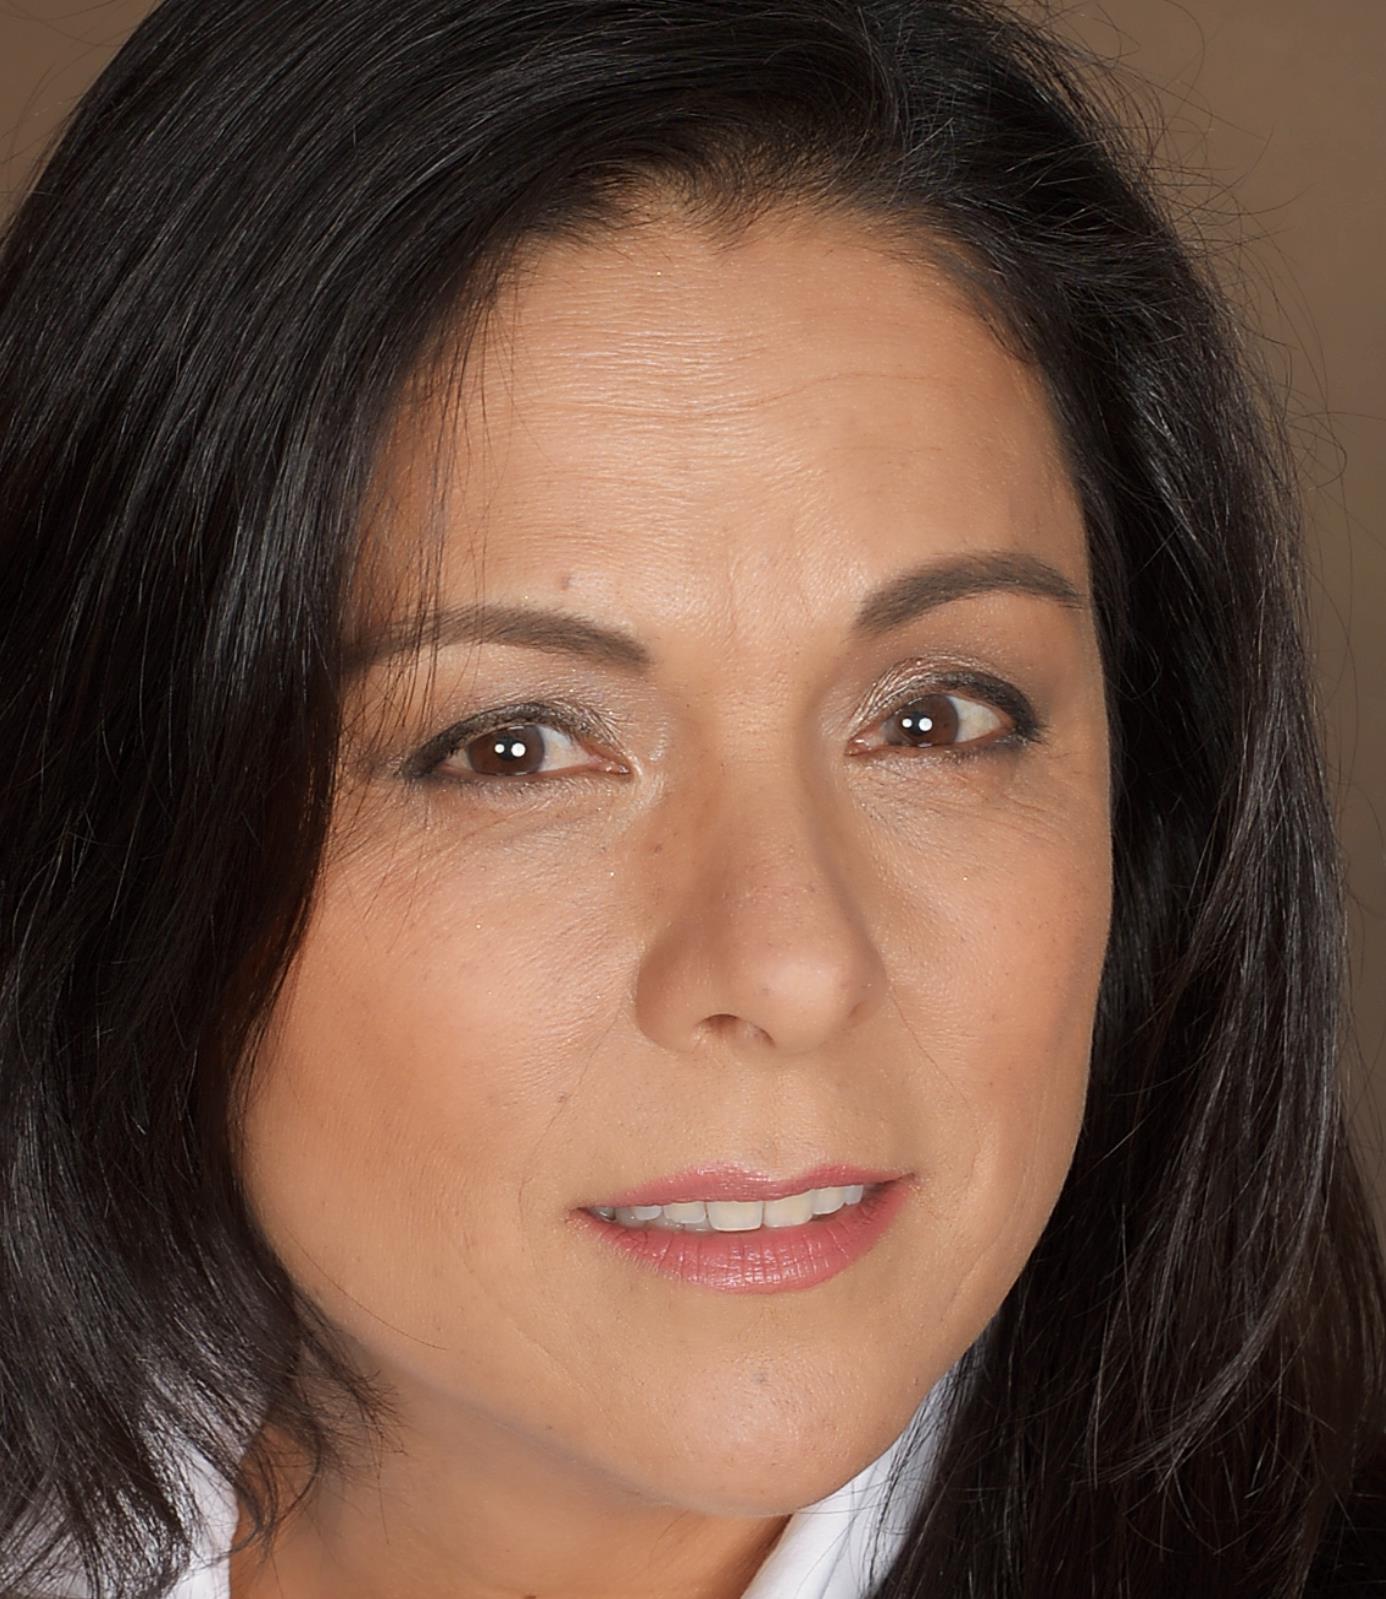 Martina Renville